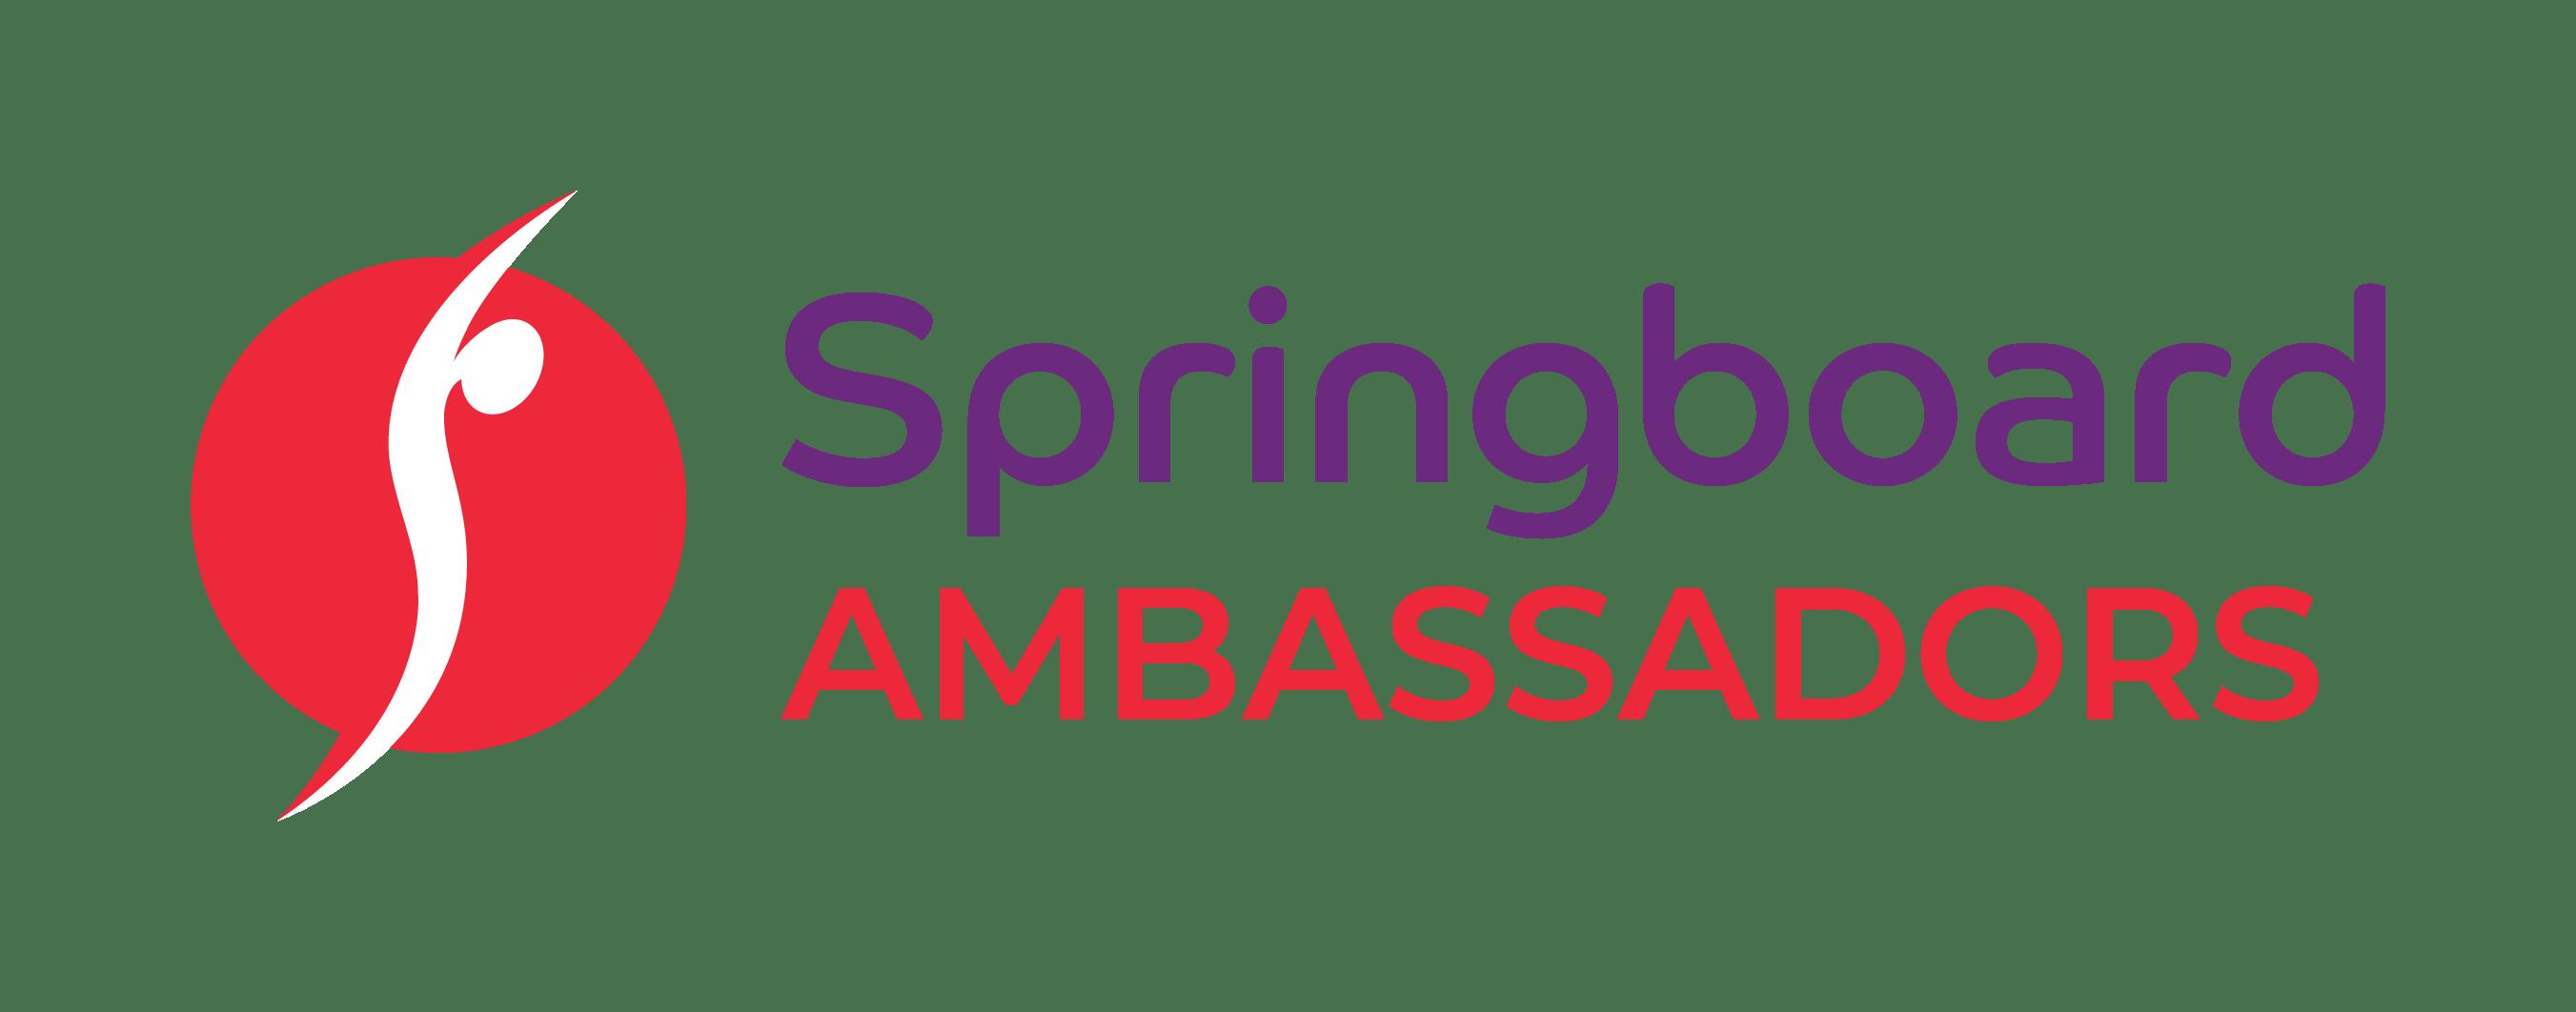 Springboard Ambassadors Logo PNG